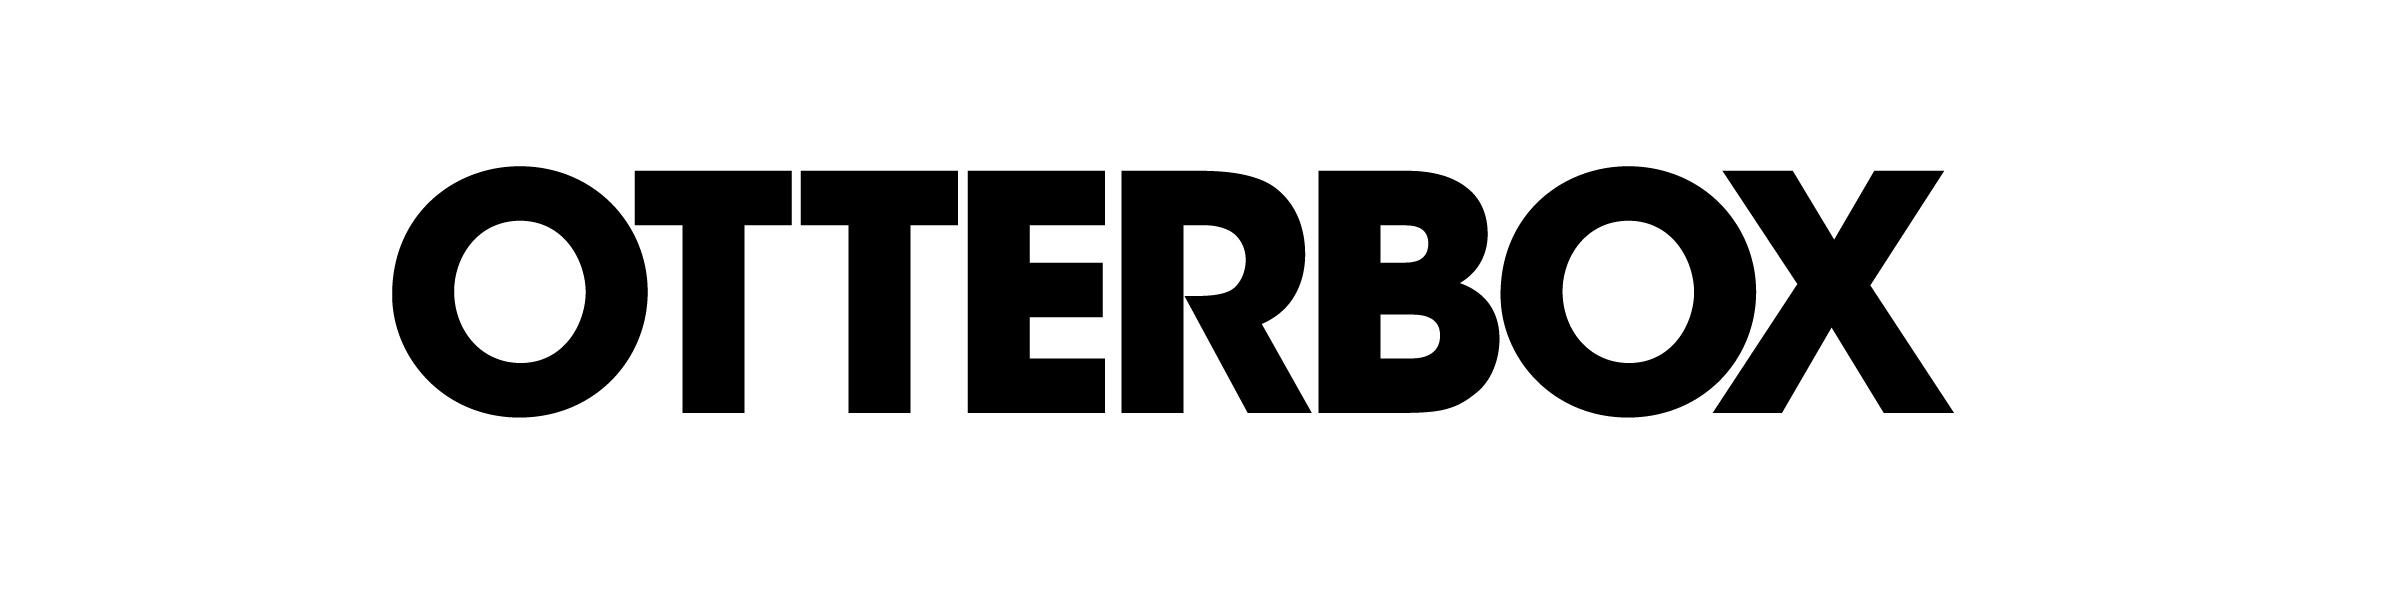 OtterBox Image